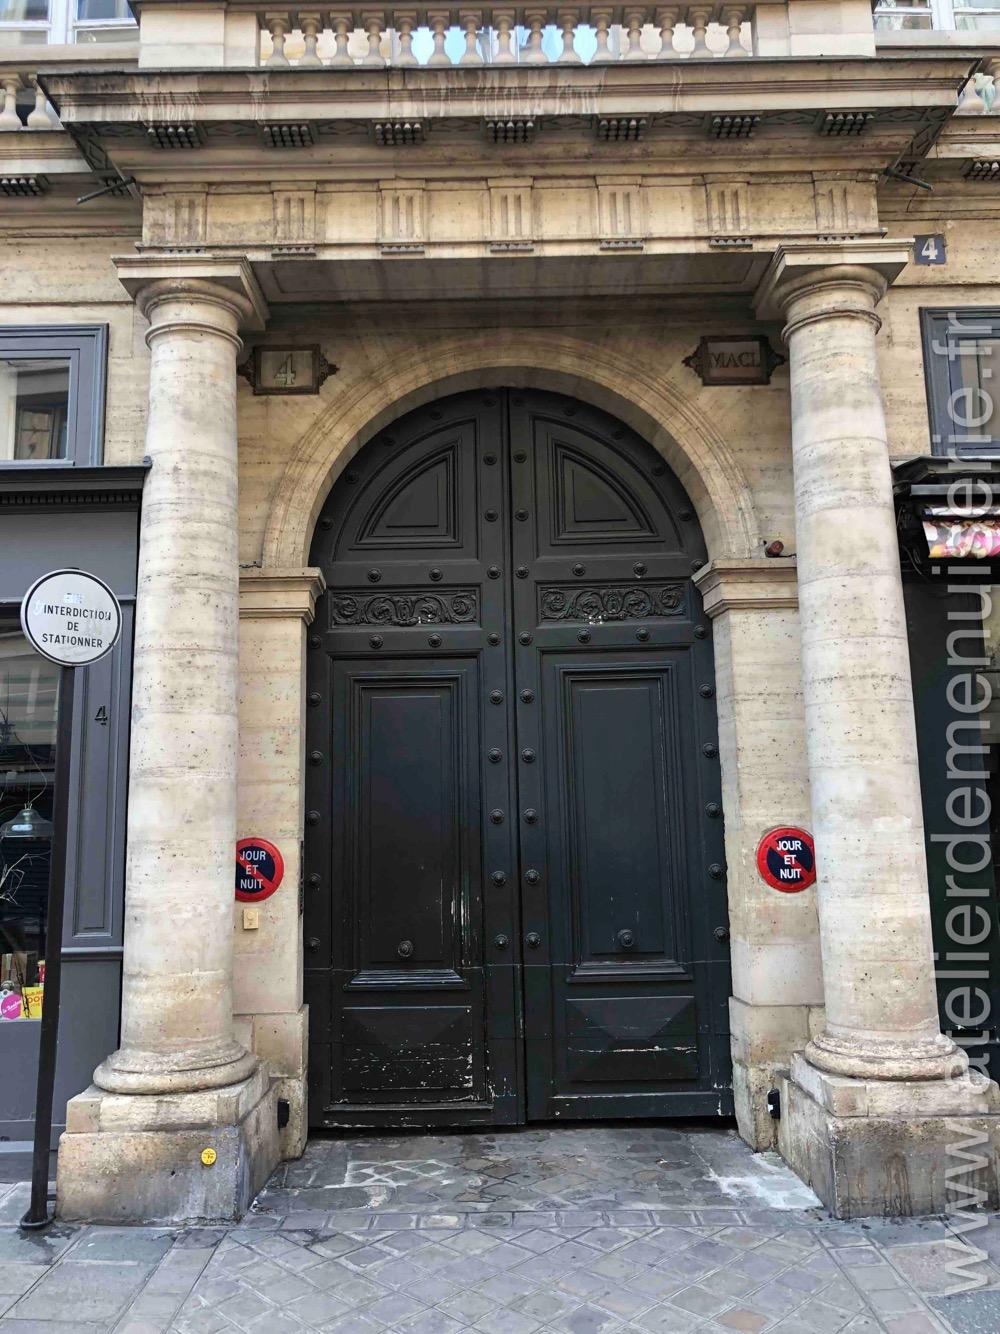 Porte Monumentale - 4 RUE DE TOURNON PARIS 6